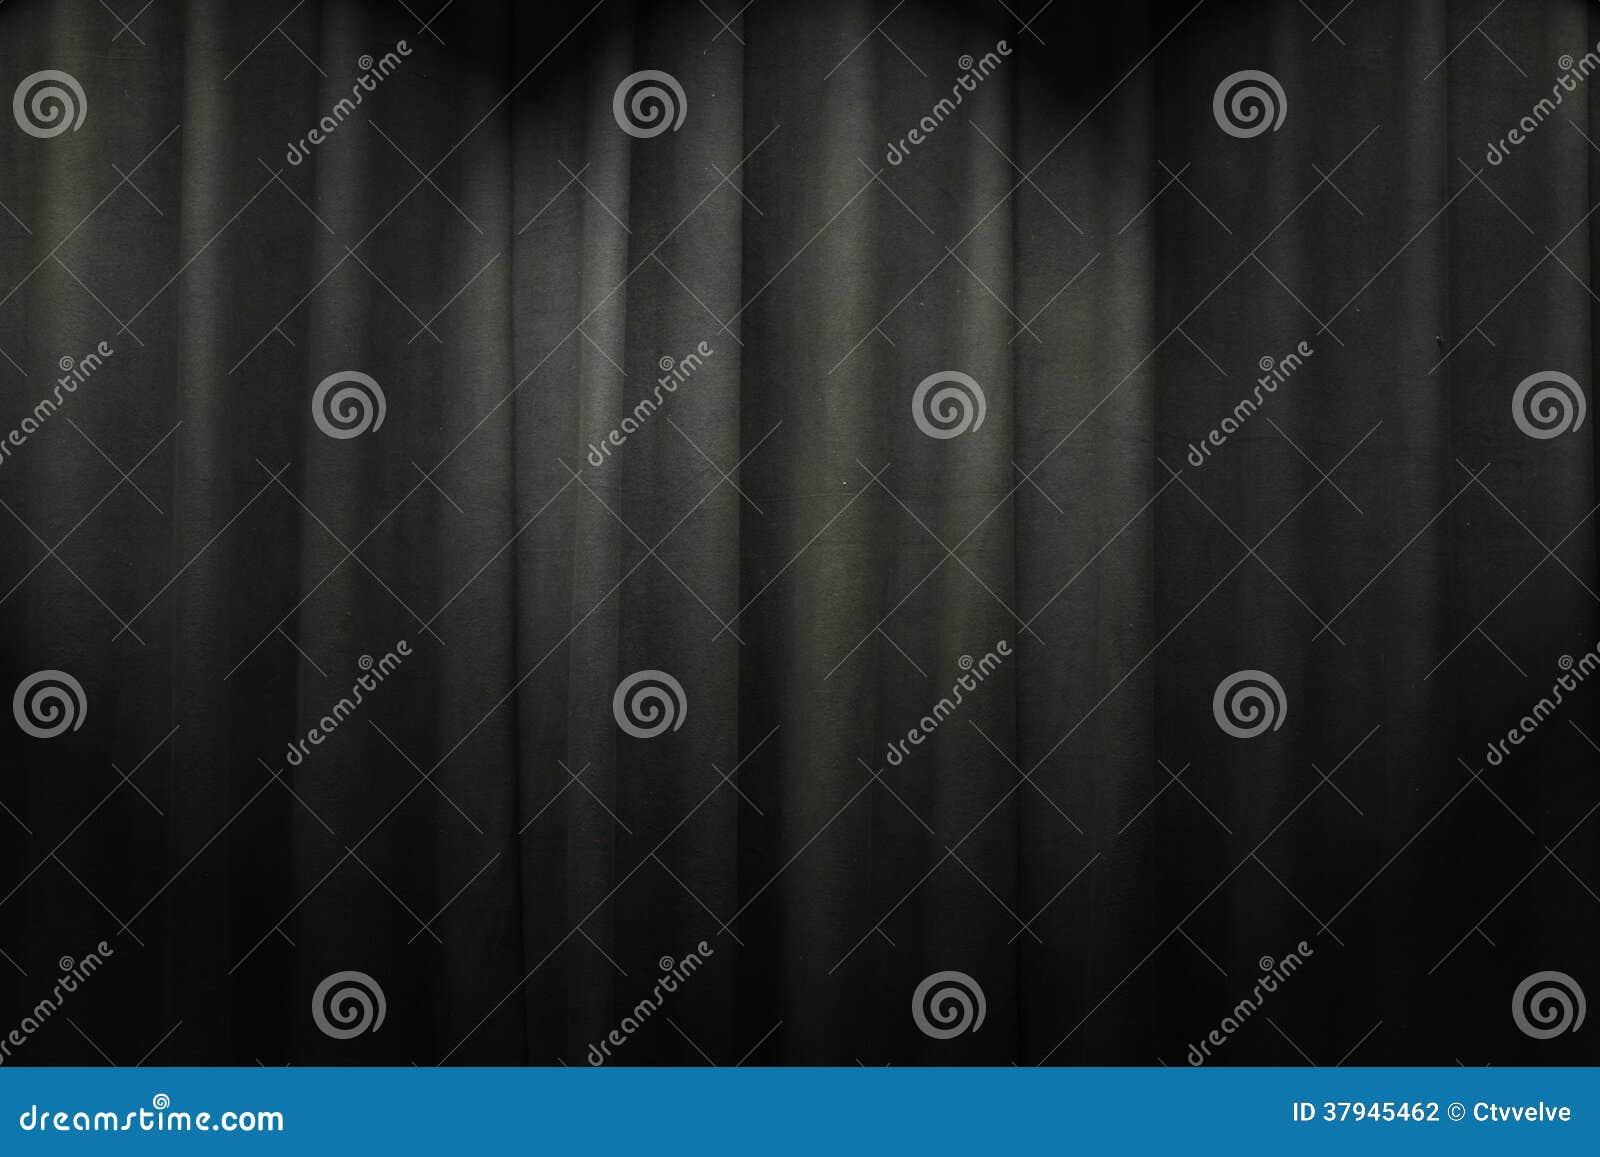 Black Curtain Texture curtain texture black stock photography - image: 37945462